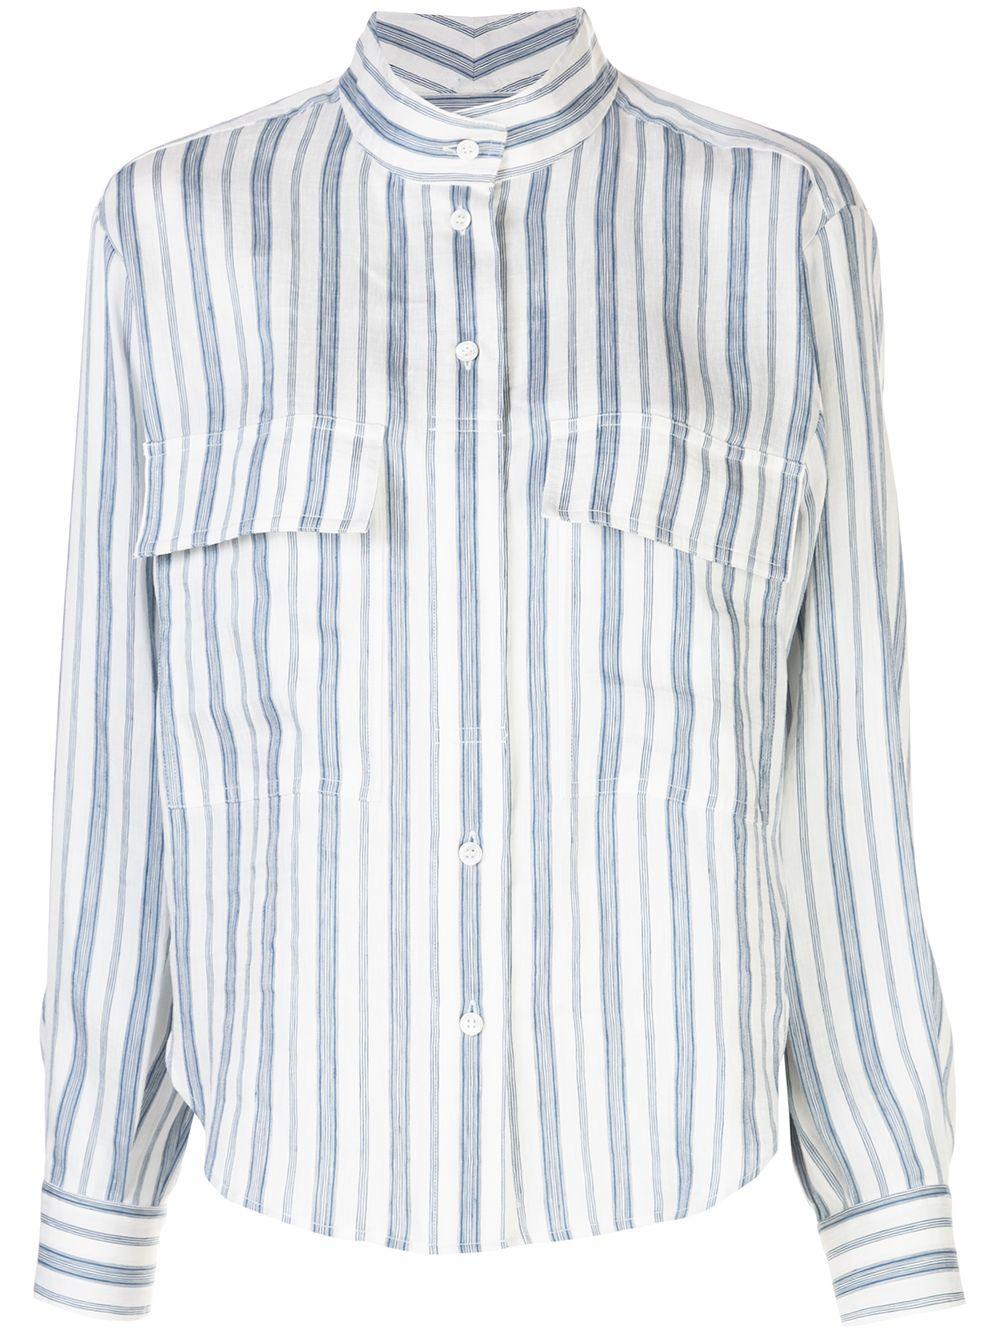 Clean Striped Safari Shirt Item # LWSH1679